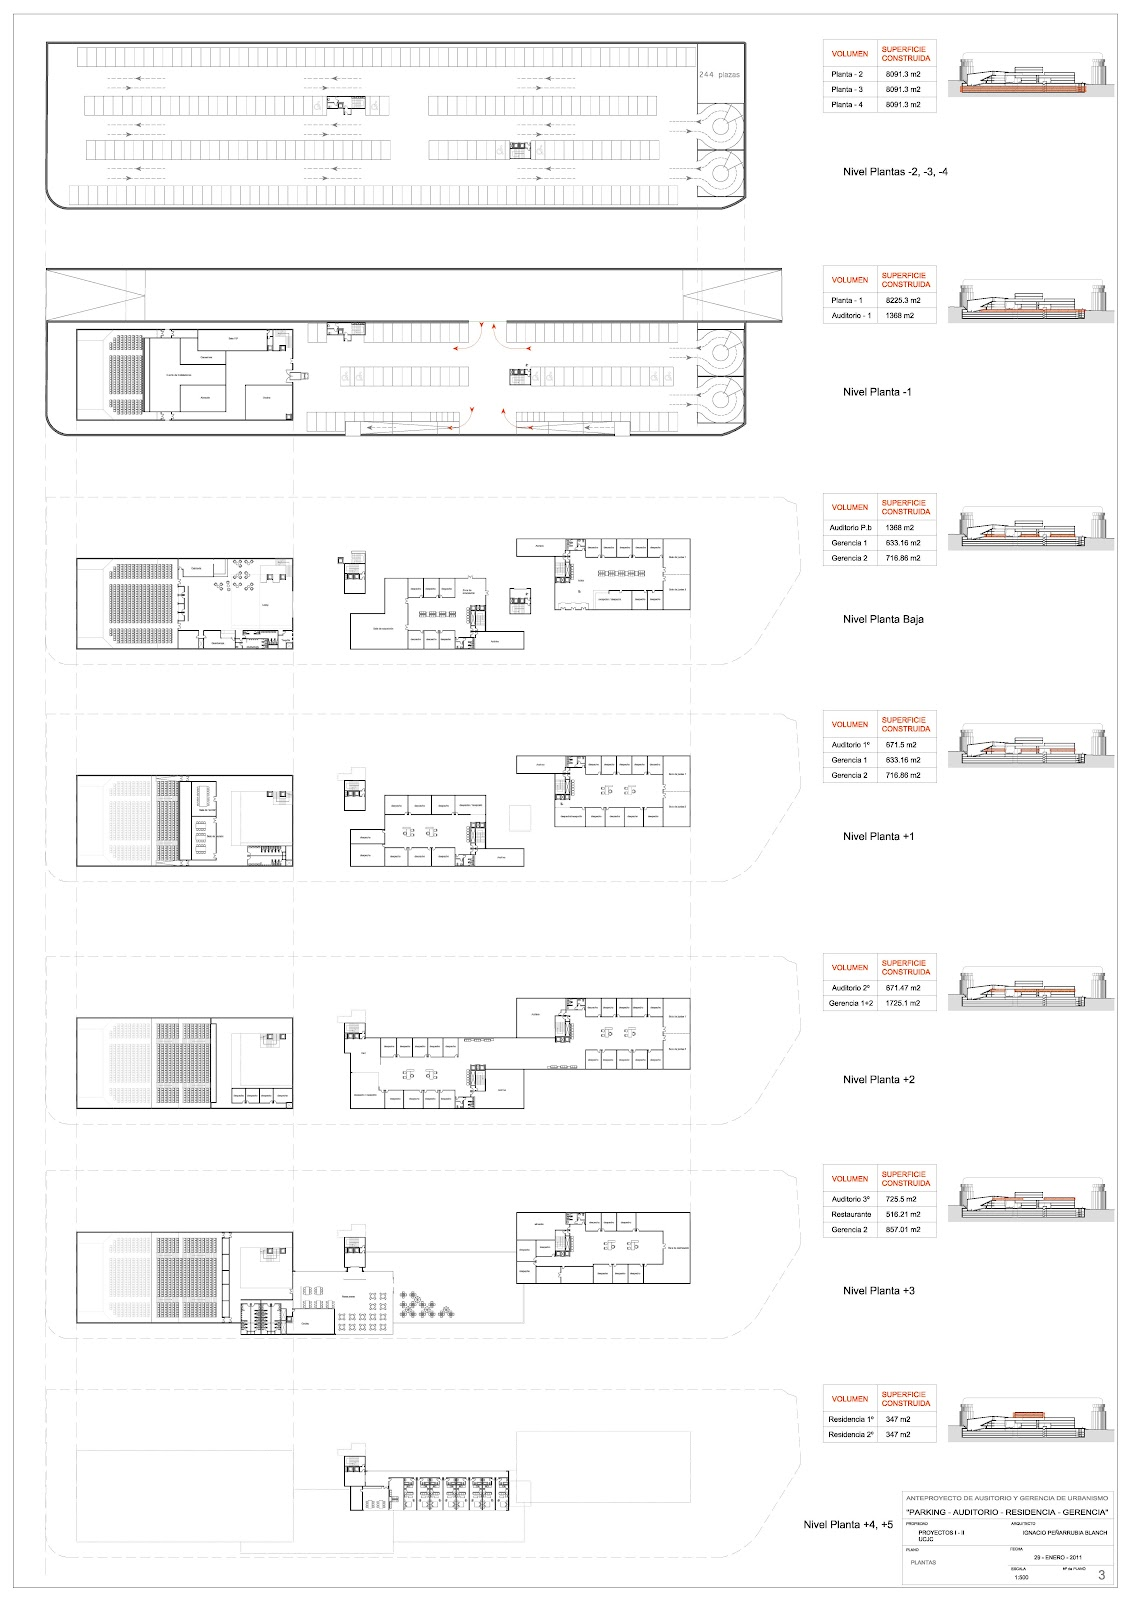 Ignacio pe arrubia blanch auditorio santiago bernabeu for Simbologia de planos arquitectonicos